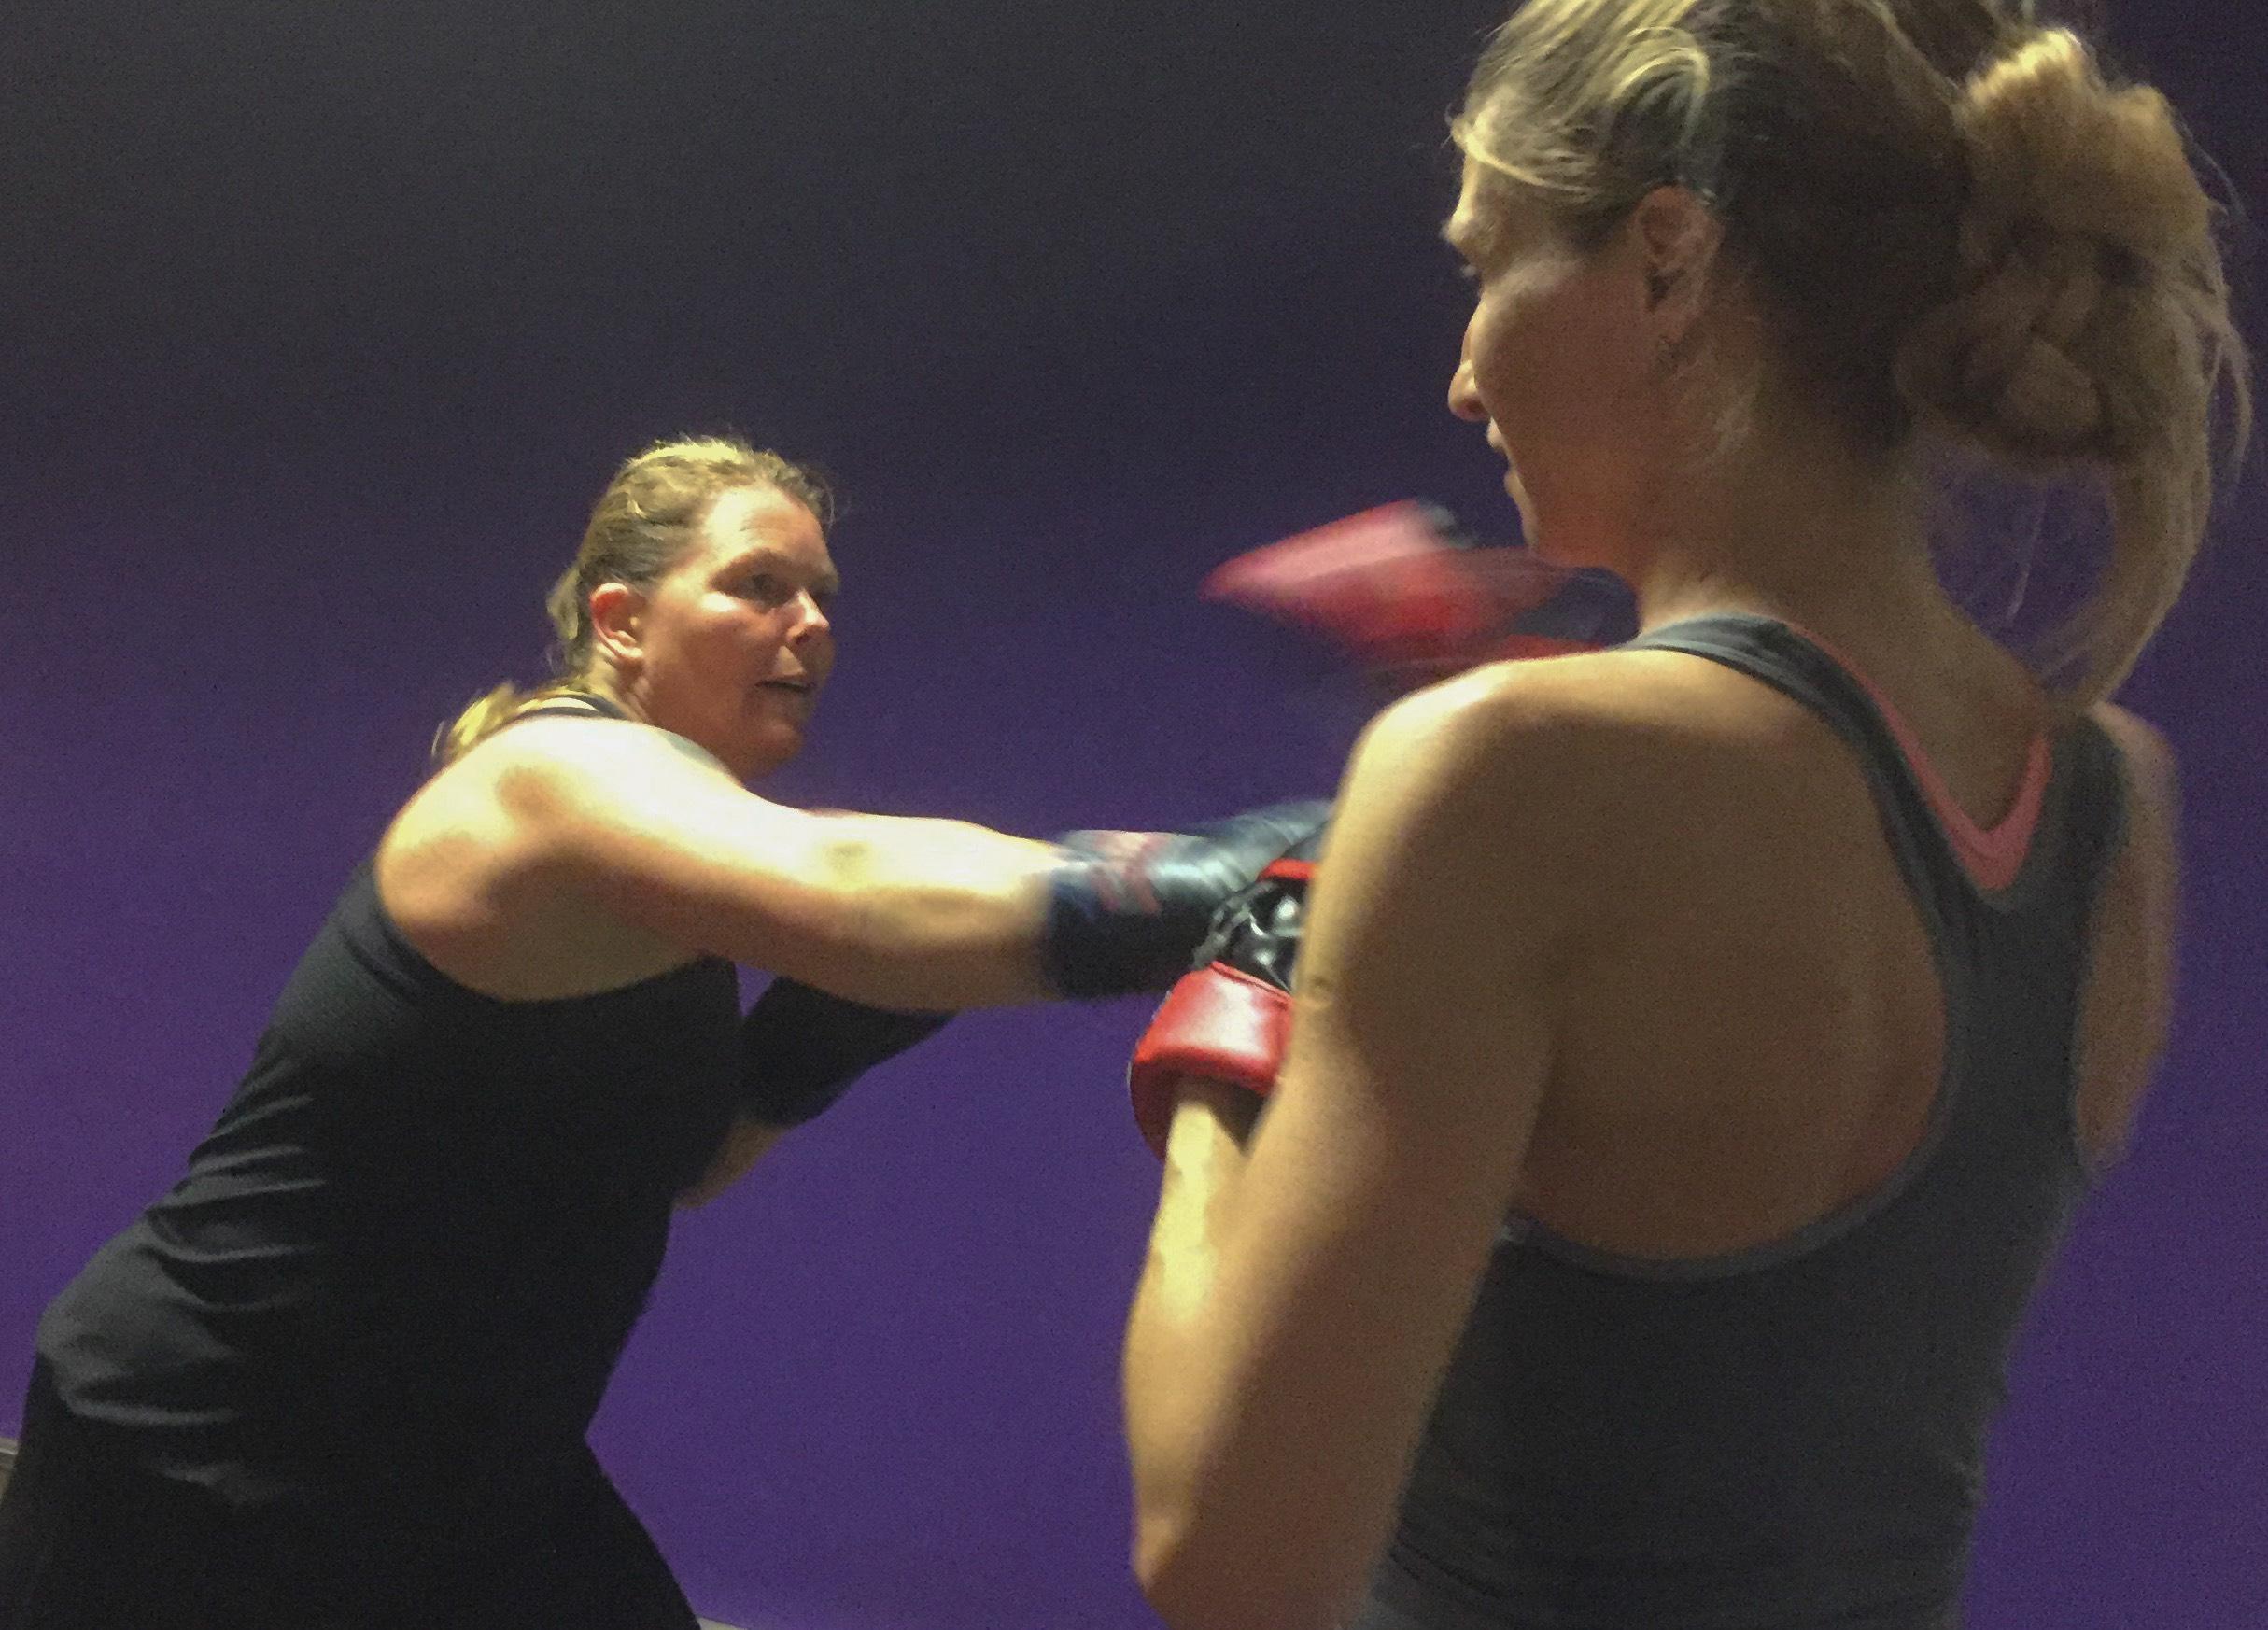 blow-boxing-photo-bodil-fuhr